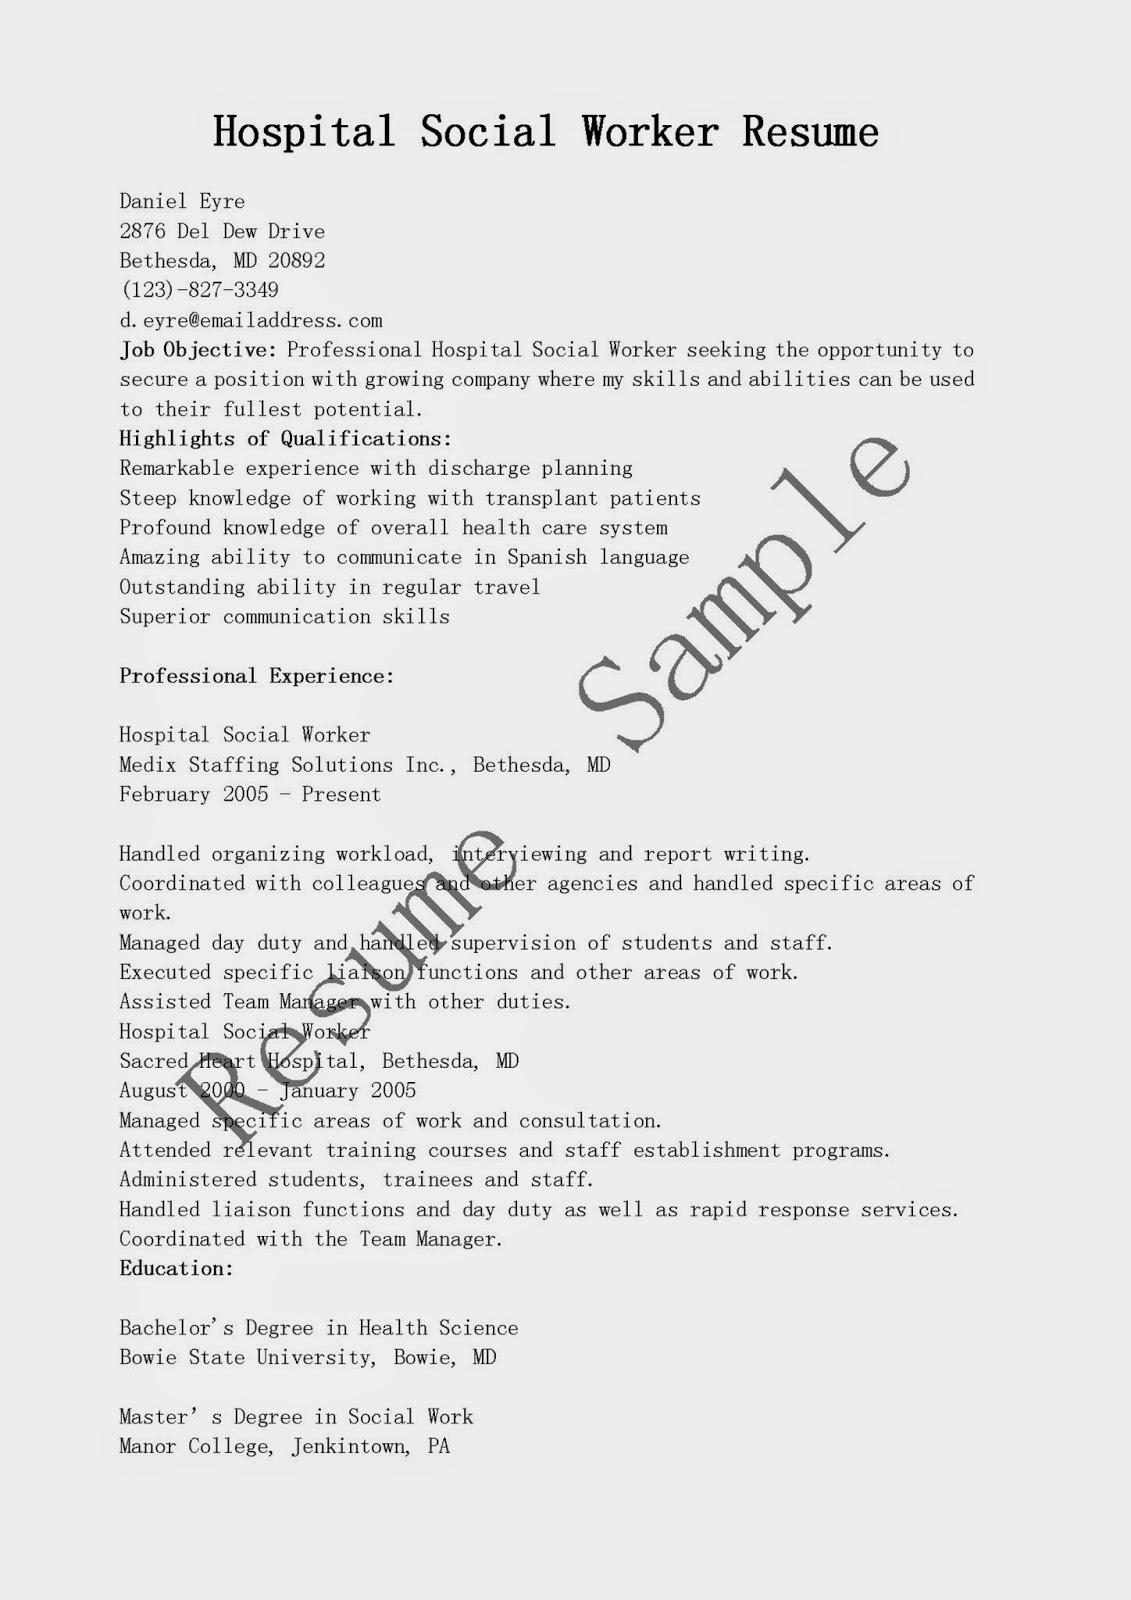 Resume Samples Hospital Social Worker Sample